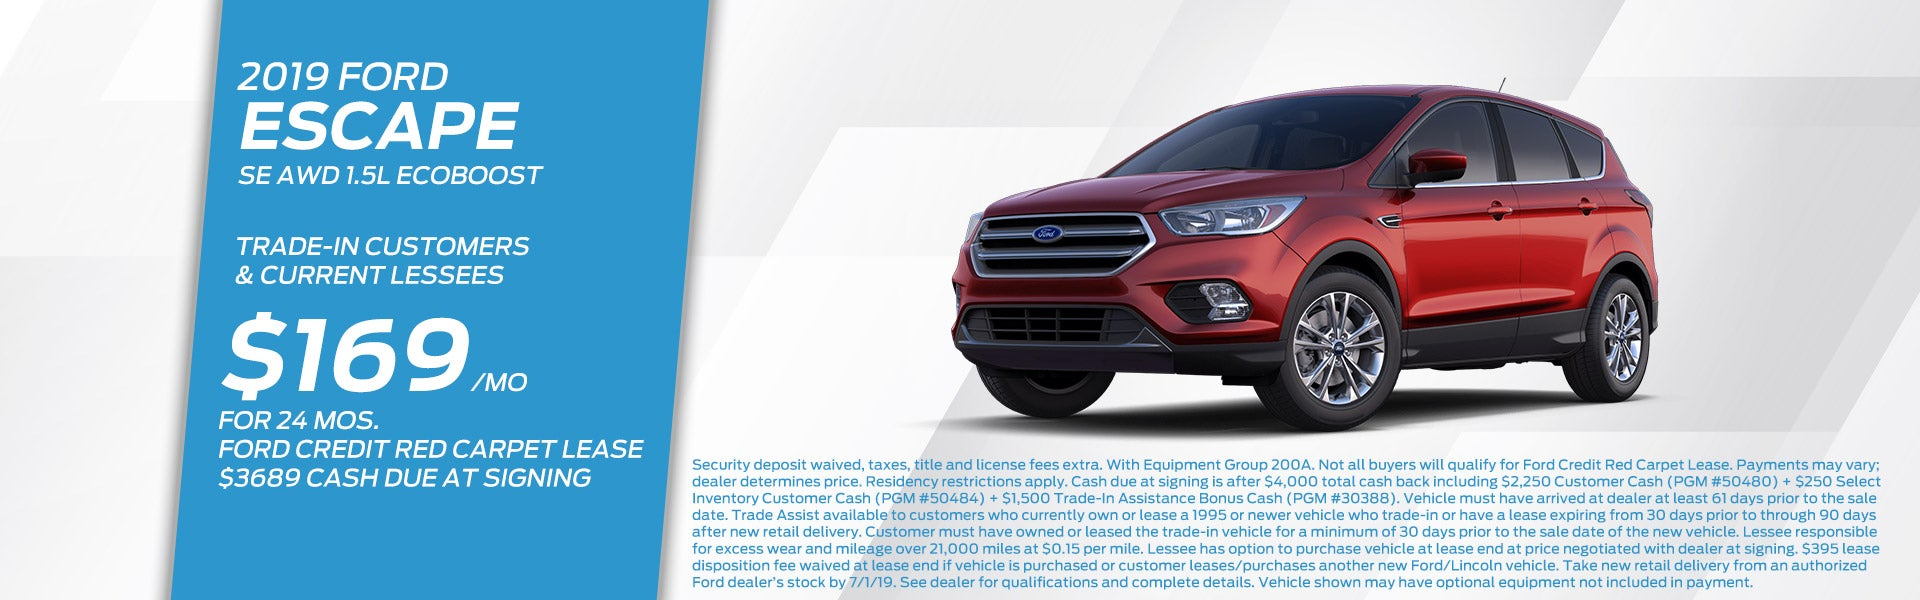 Najlepsze ceny na samochody na Independence Day u Danuty z Ford of Scarsdale NY